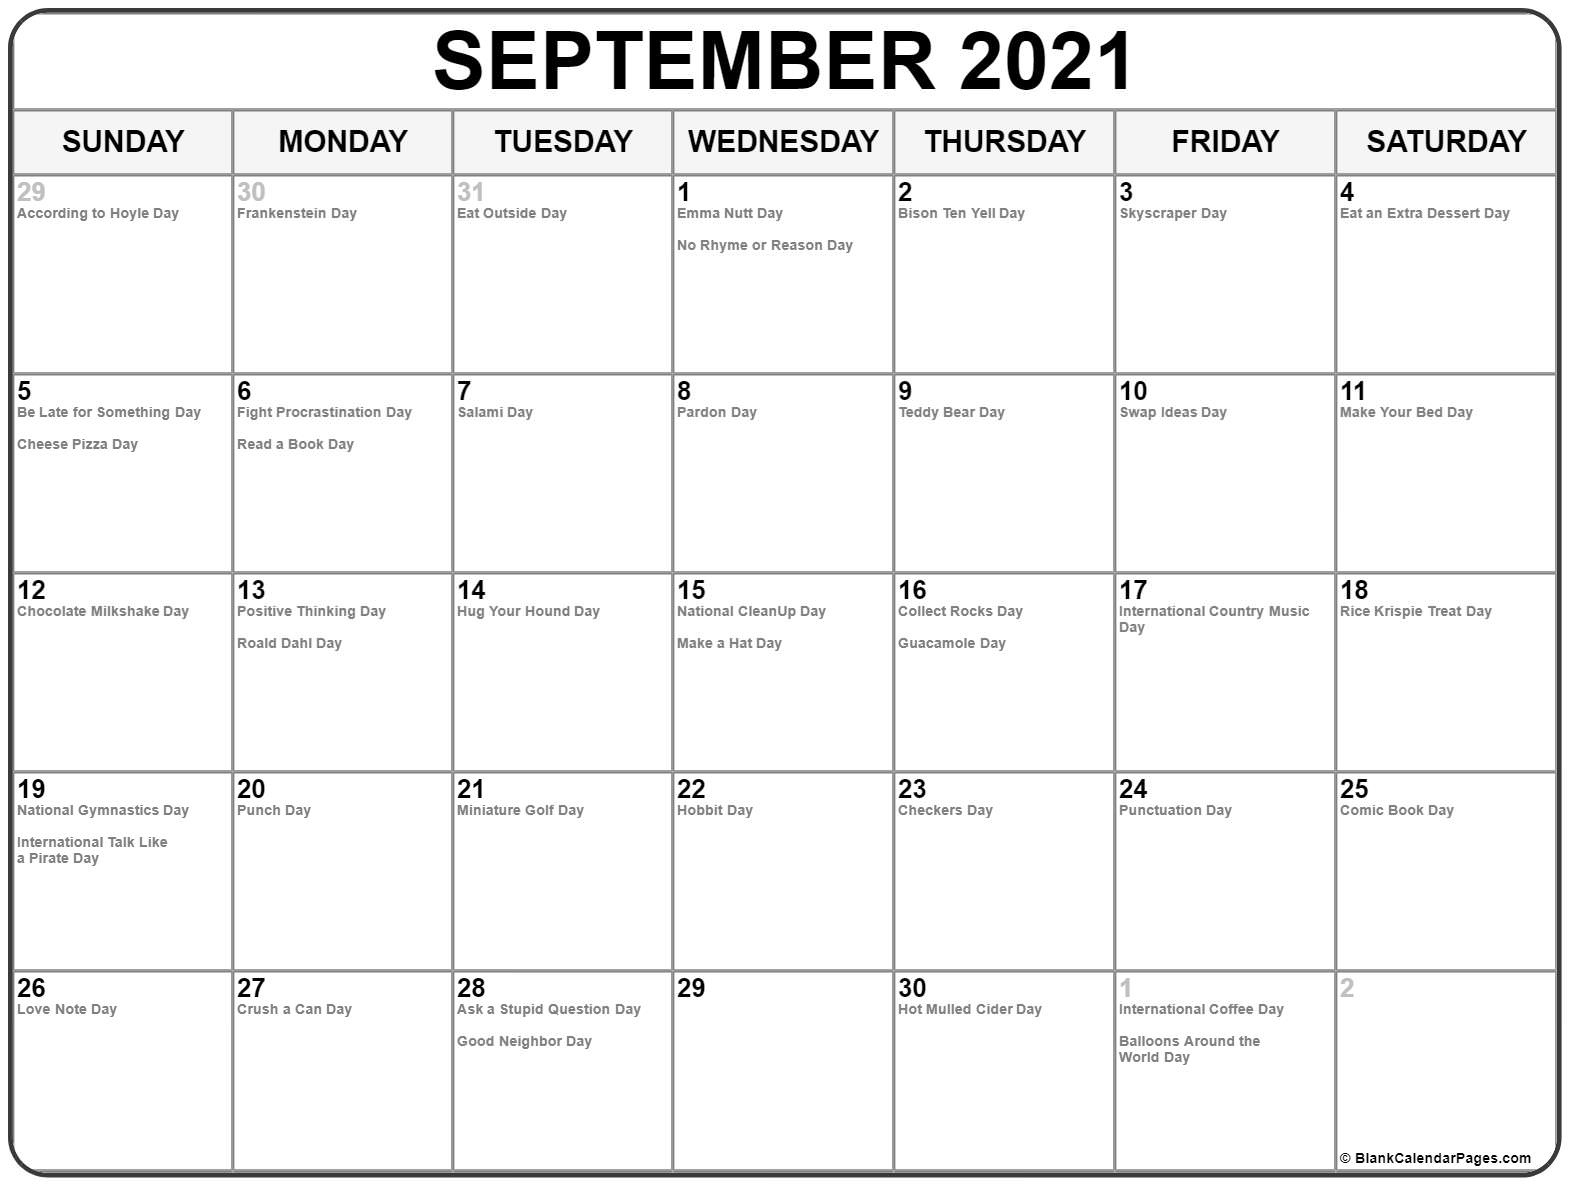 Collection Of September 2021 Calendars With Holidays Canada September 2021 Calendar